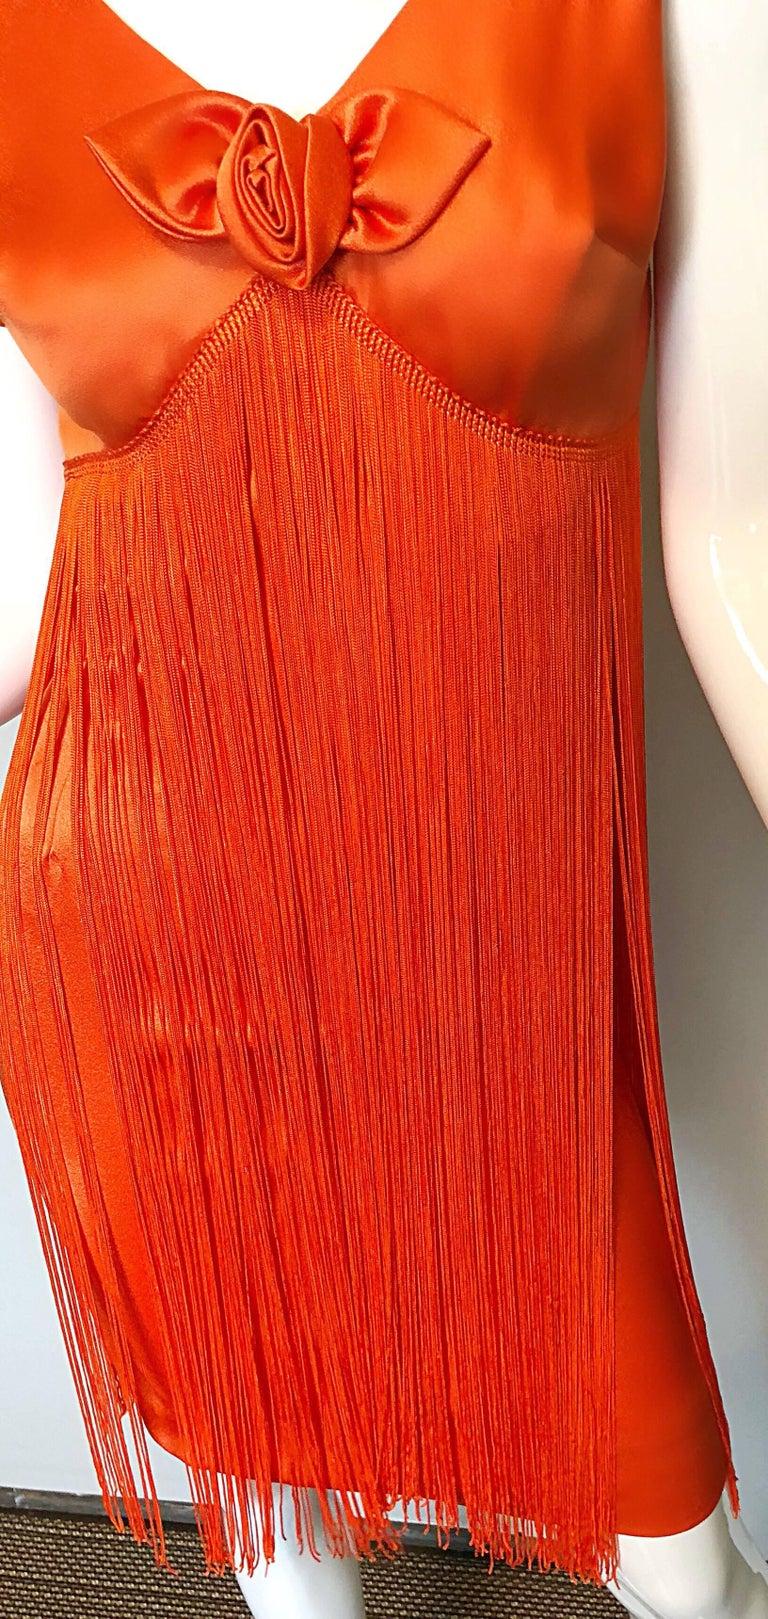 Joseph Magnin 1960s Amazing Bright Orange Fully Fringe Flapper Jersey 60s Dress For Sale 1